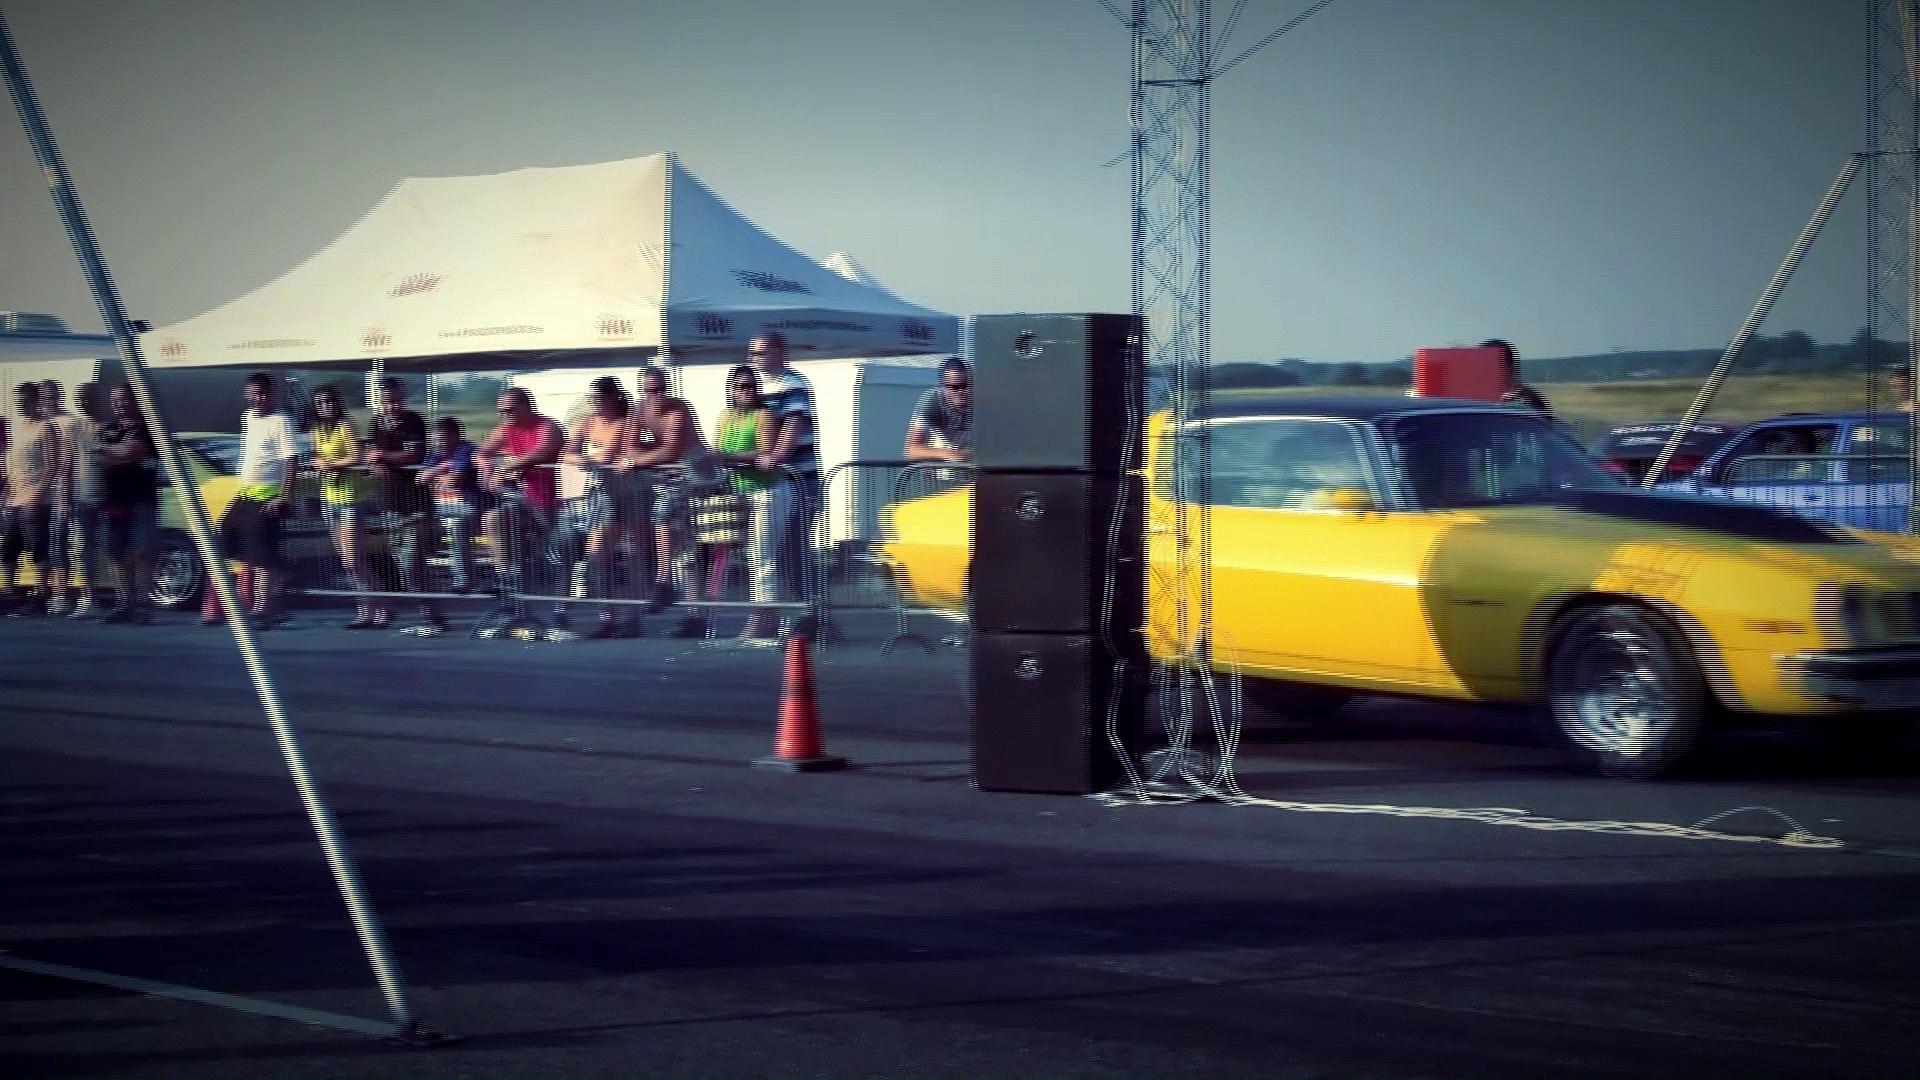 Chevrolet Camaro 7.0 Nitro Vs. Chevrolet Camaro 6.6 Nitro Drag Race HD